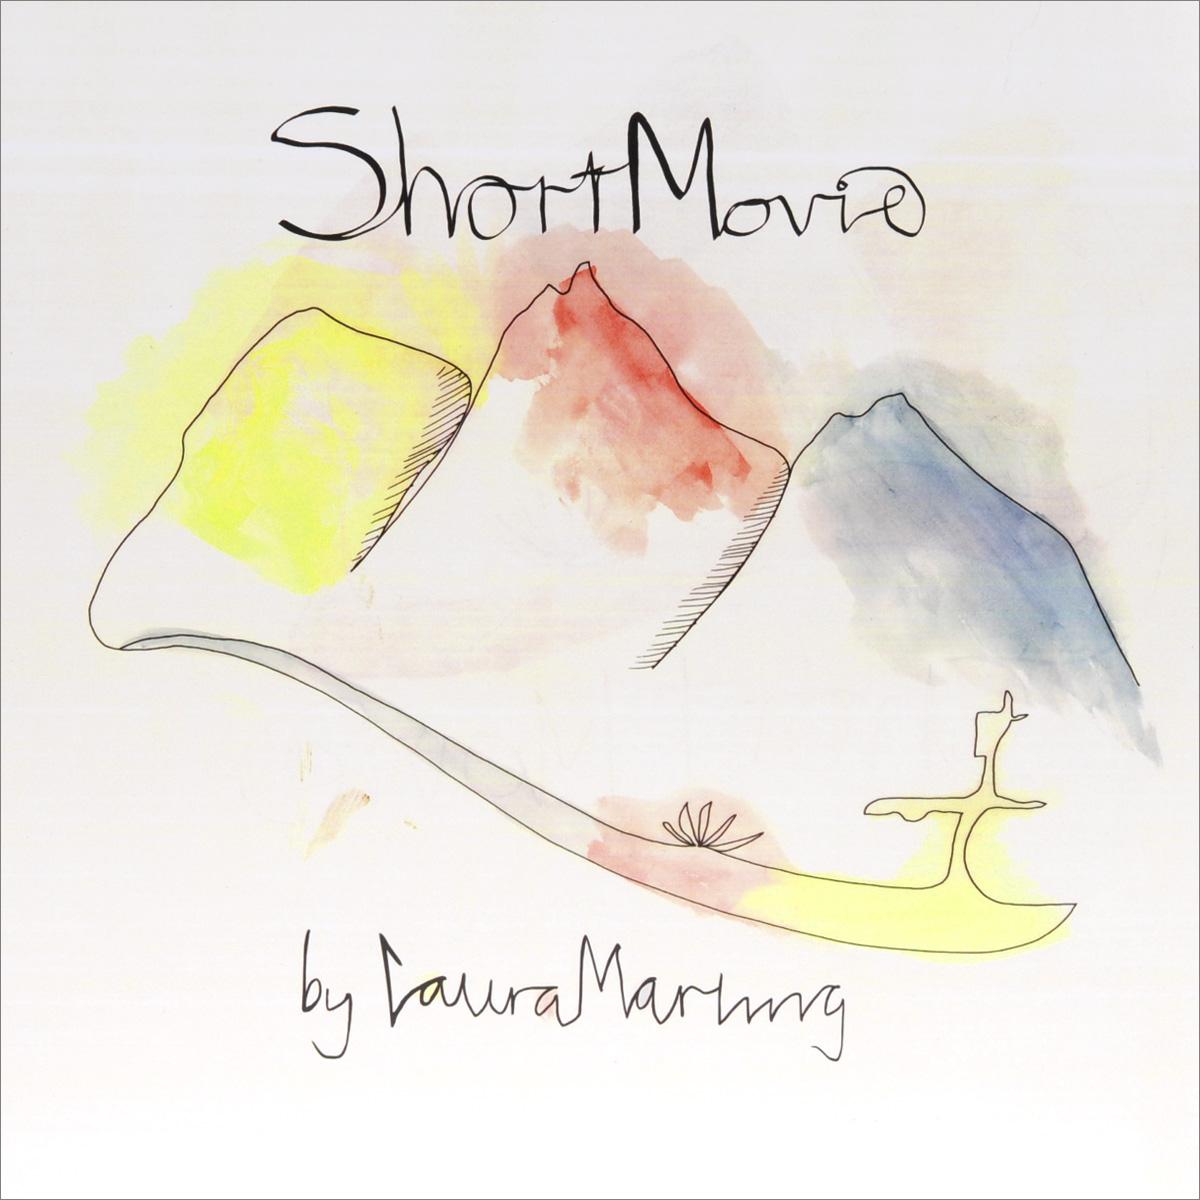 Лаура Марлинг Laura Marling. Short Movie (2 LP) барбра стрейзанд barbra streisand encore movie partners sing broadway lp